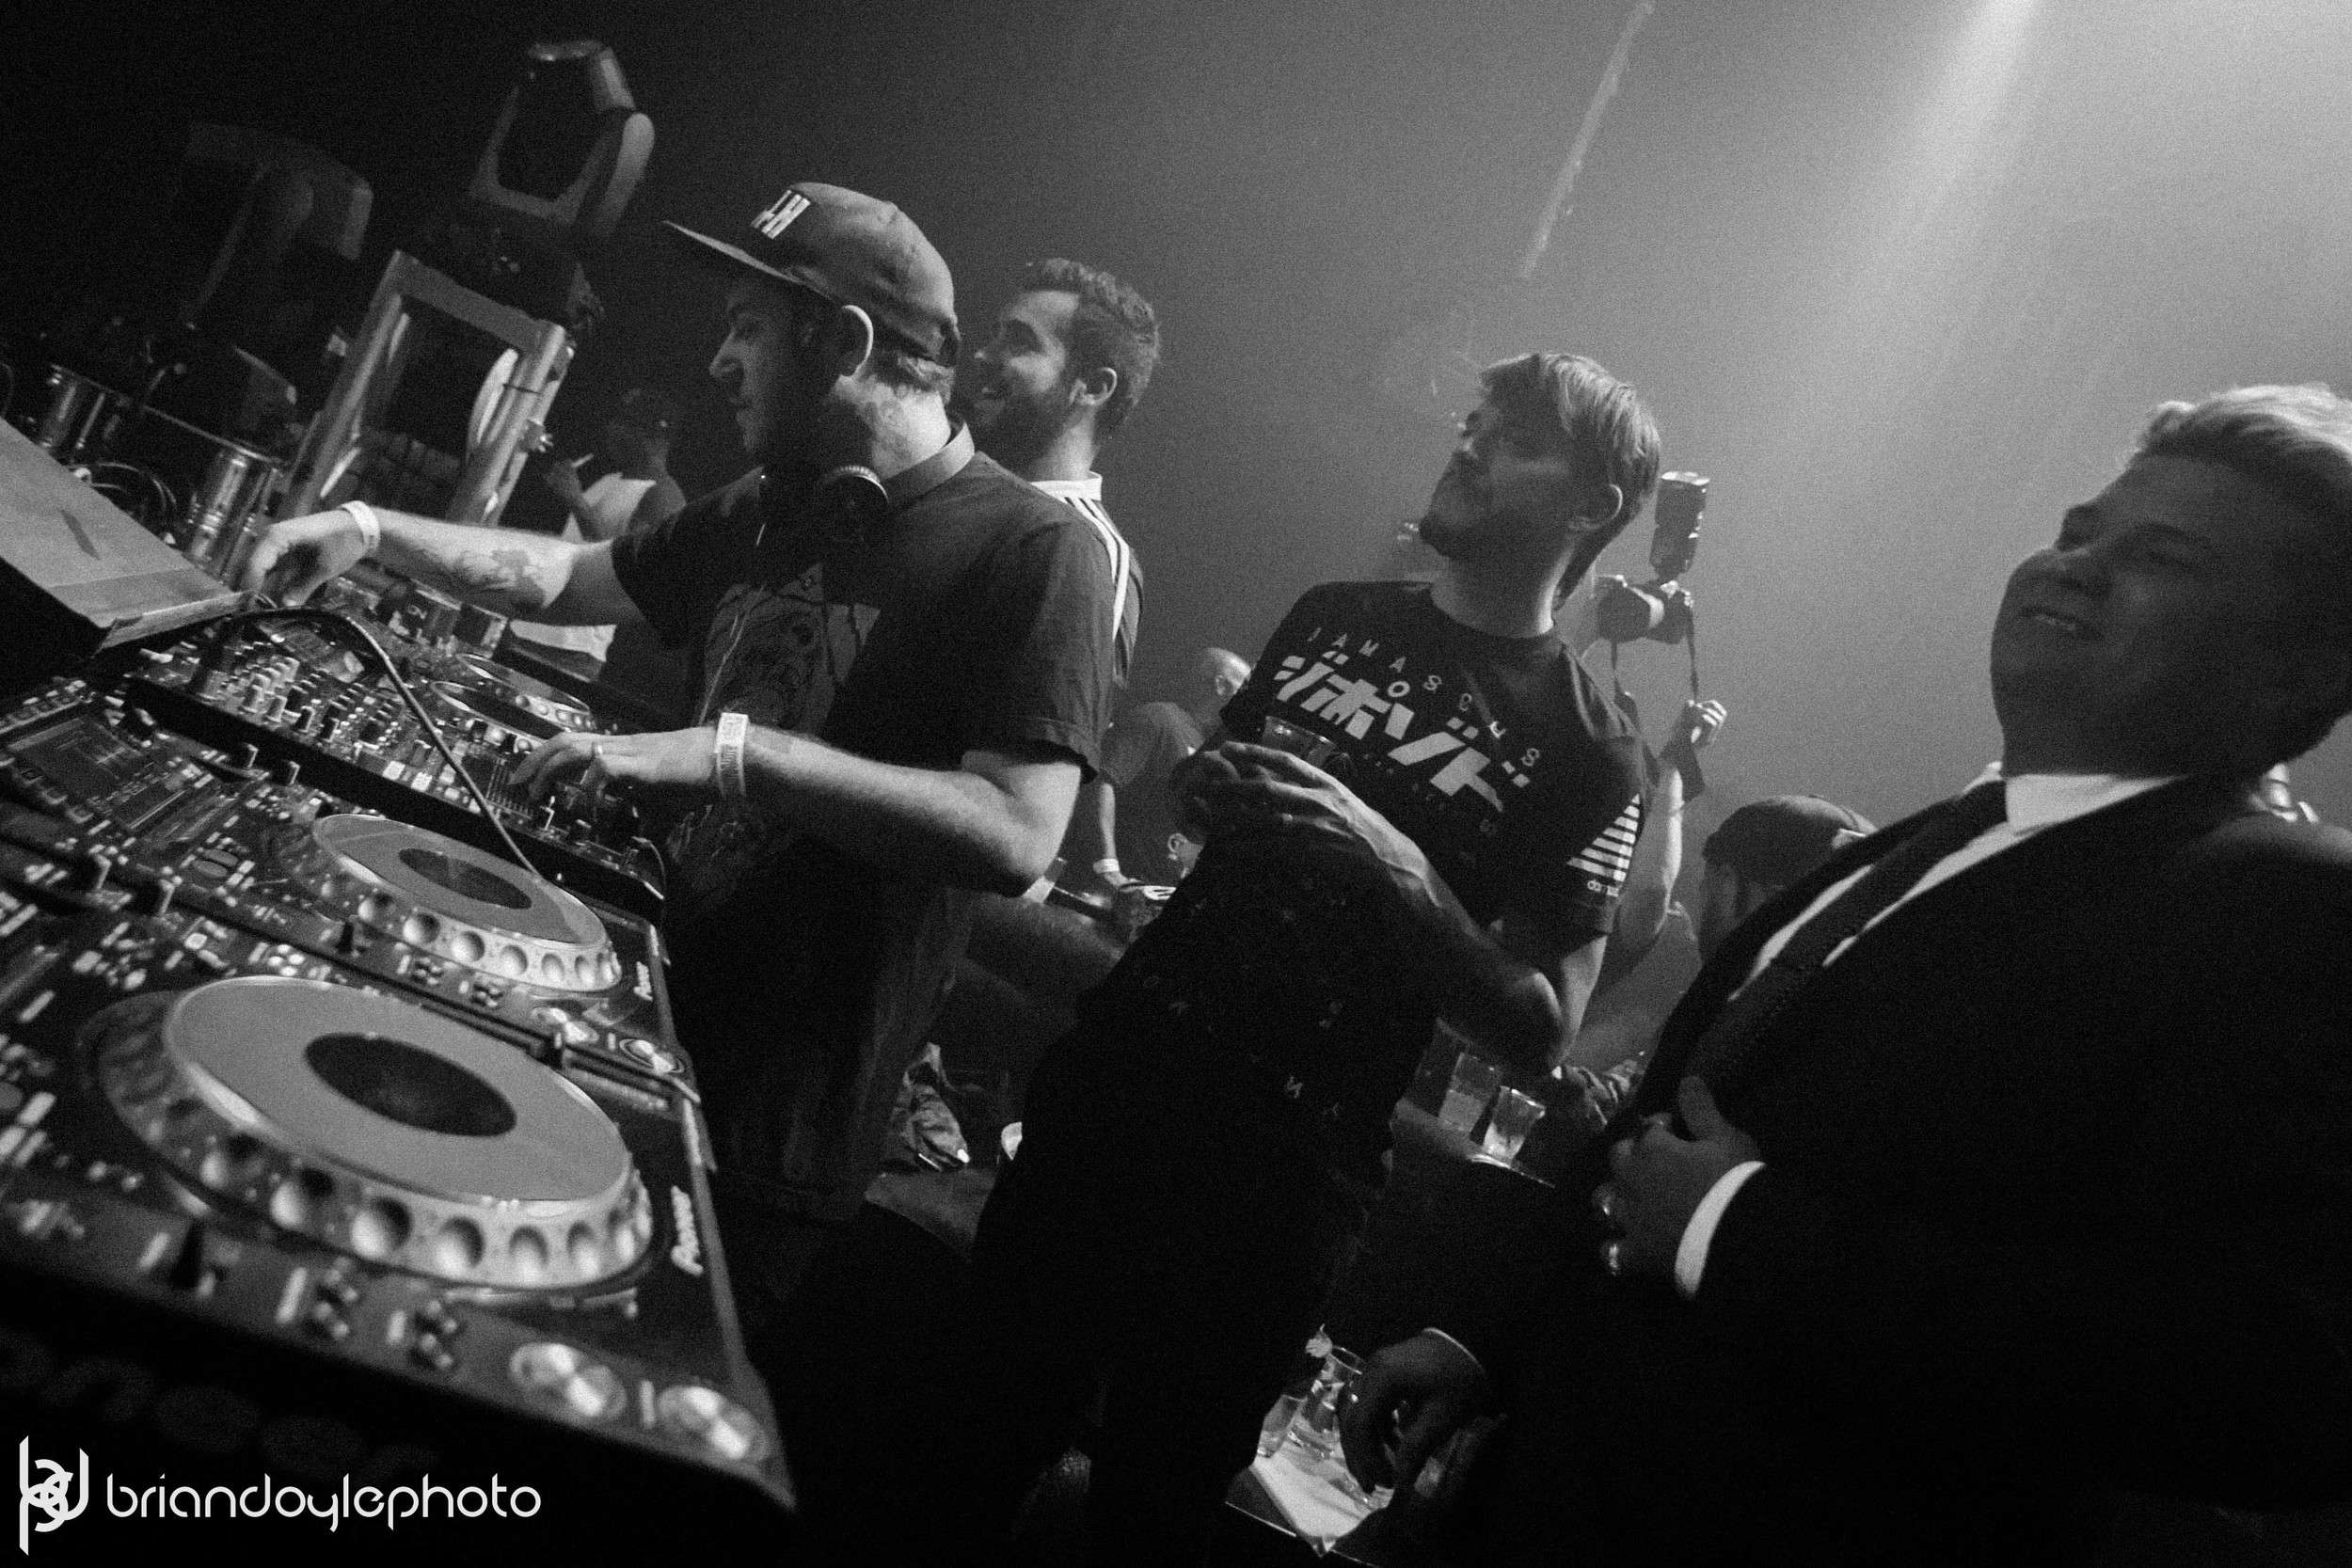 Bro Safari - Black Out Tour @ Avalon bdp 26.09.14-31.jpg